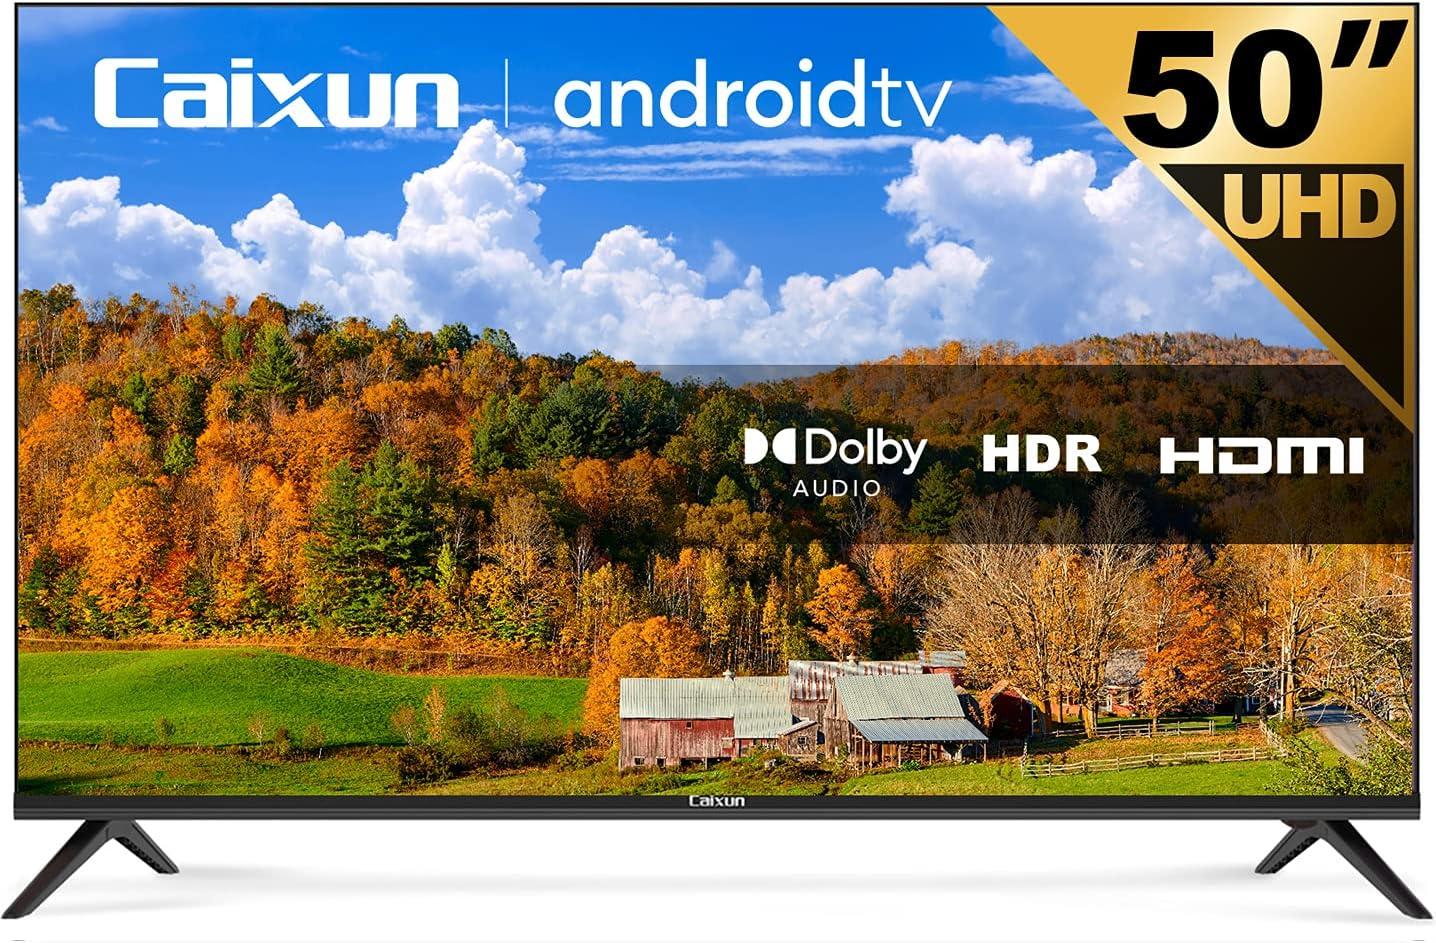 Caixun UHD Smart TV 50-inch